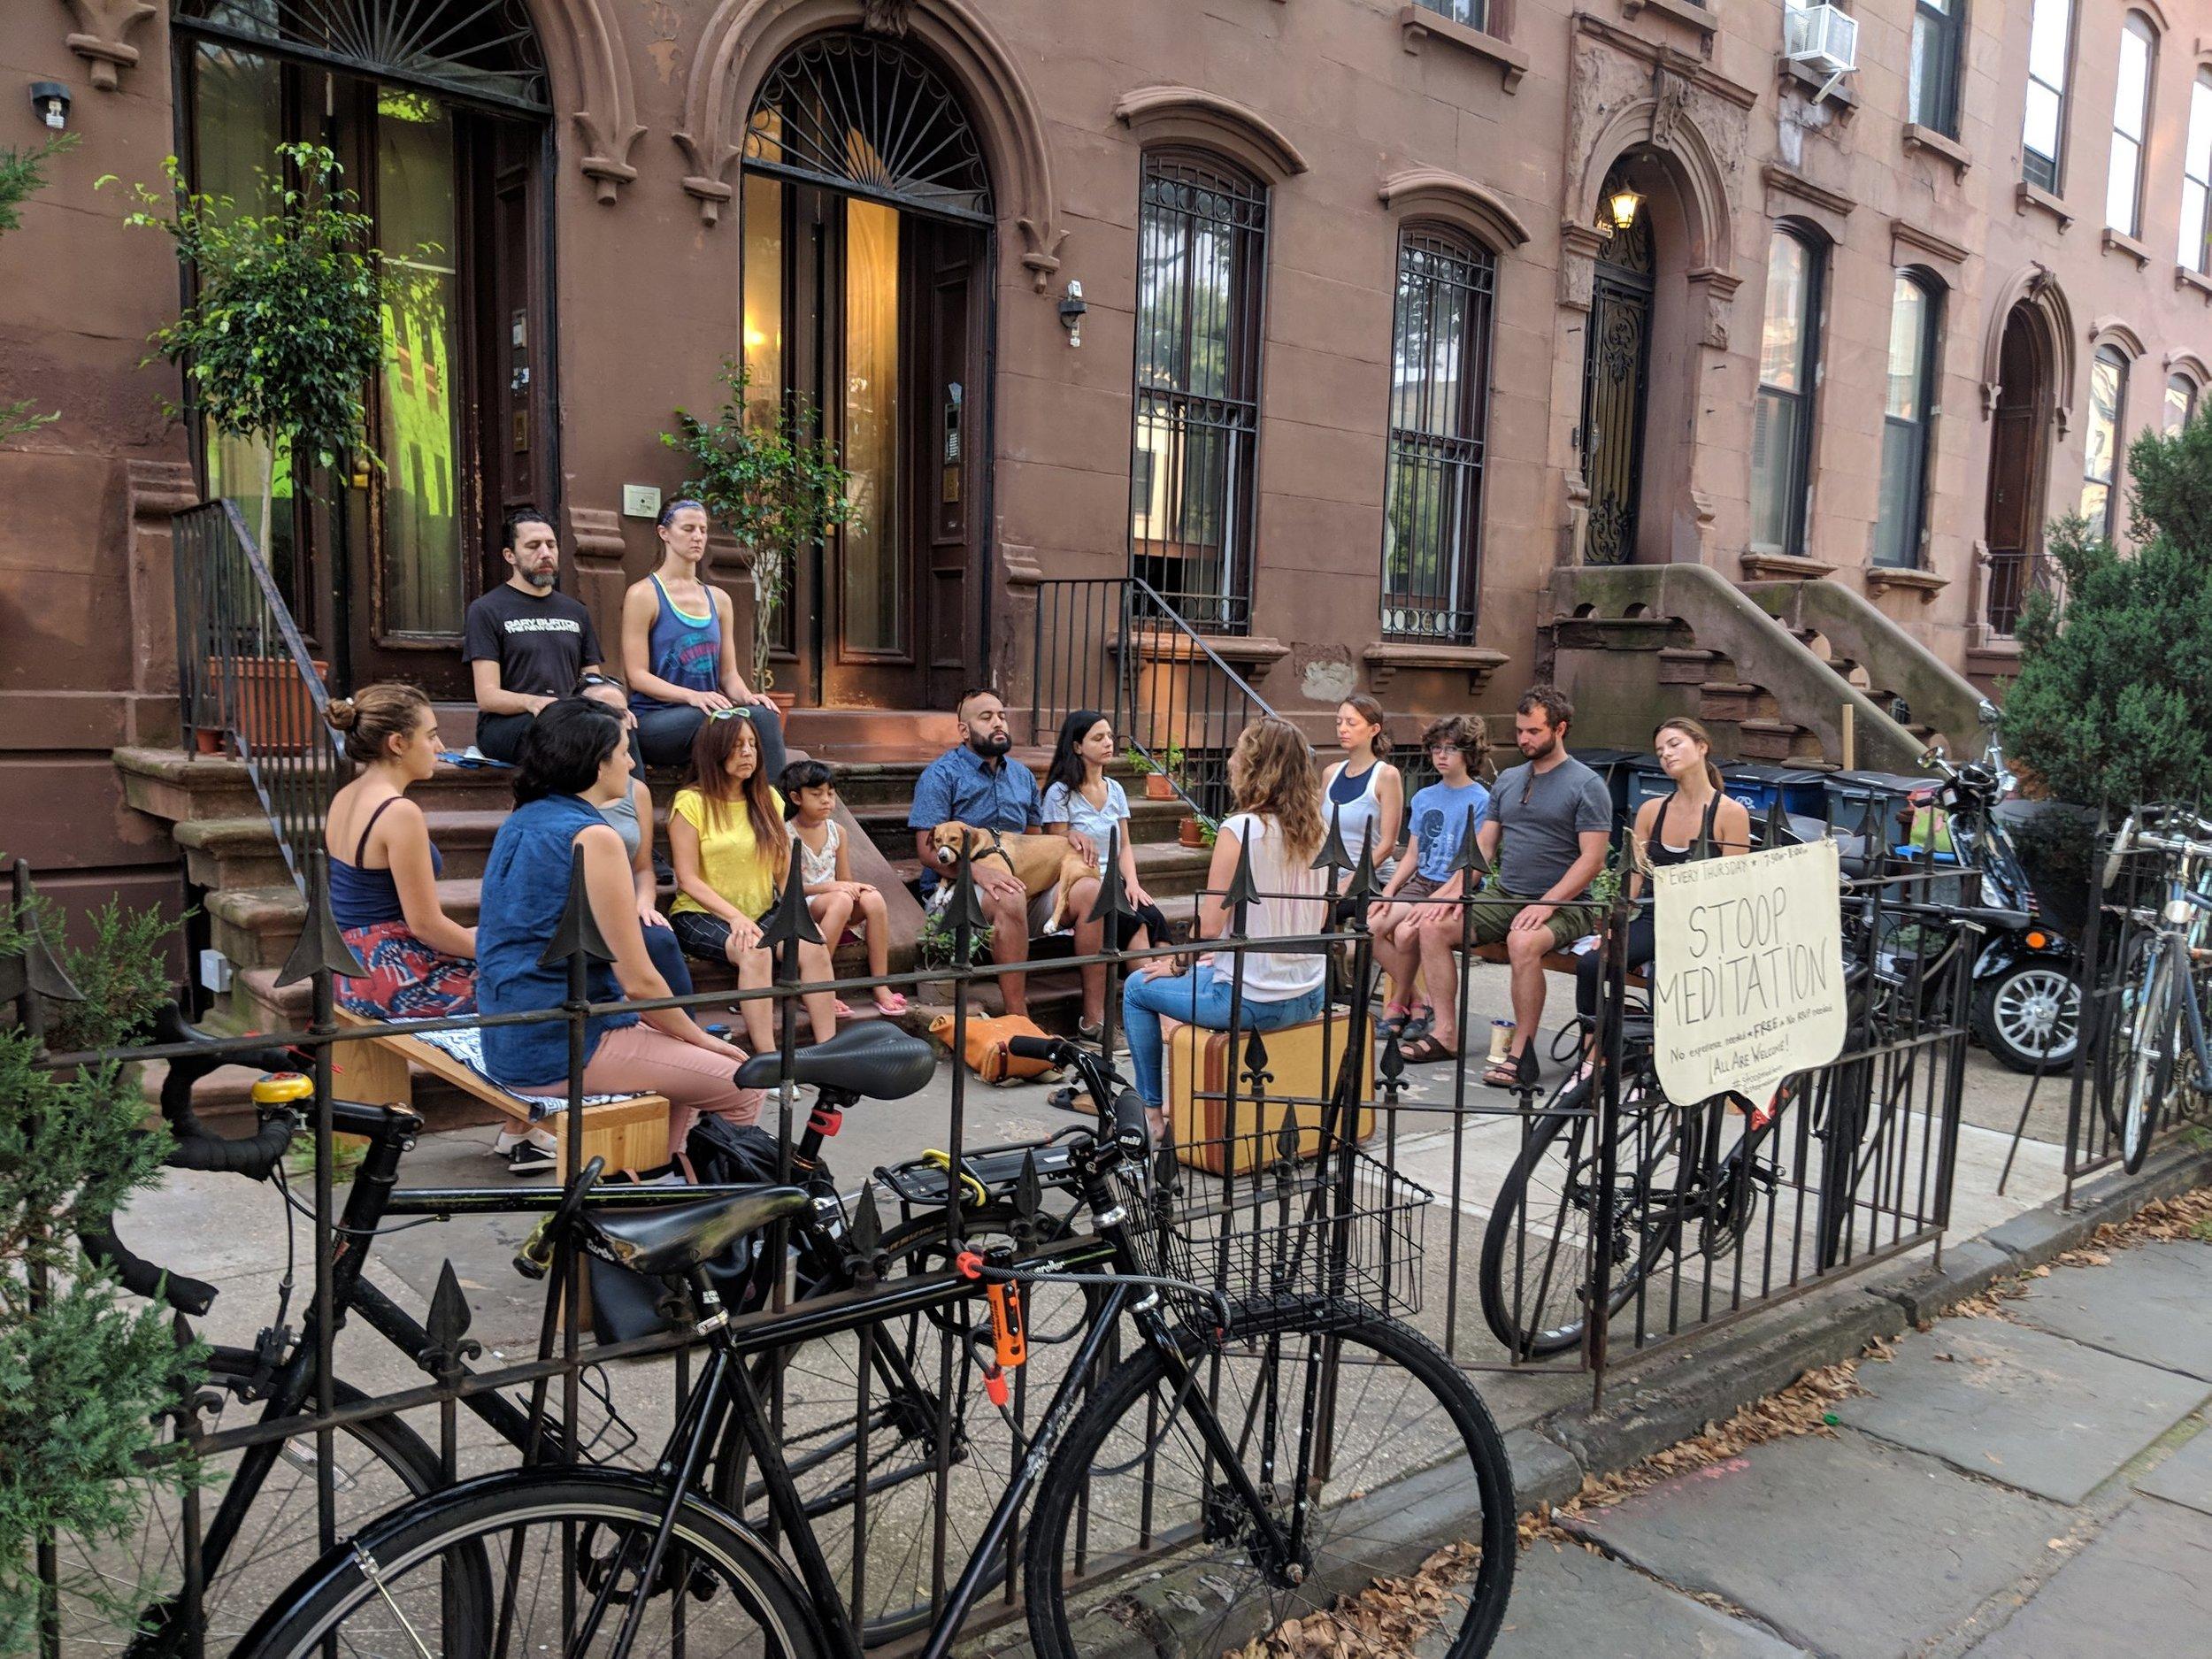 The Brooklyn Stoop - Free, No RSVP needed!June 6 - Oct 18, Every Thursday @ 7:30am - 8amLocation: 453 Washington Avenue, Brooklyn, NYStoop Meditation Teacher: Danielle Fazzolari, Founder